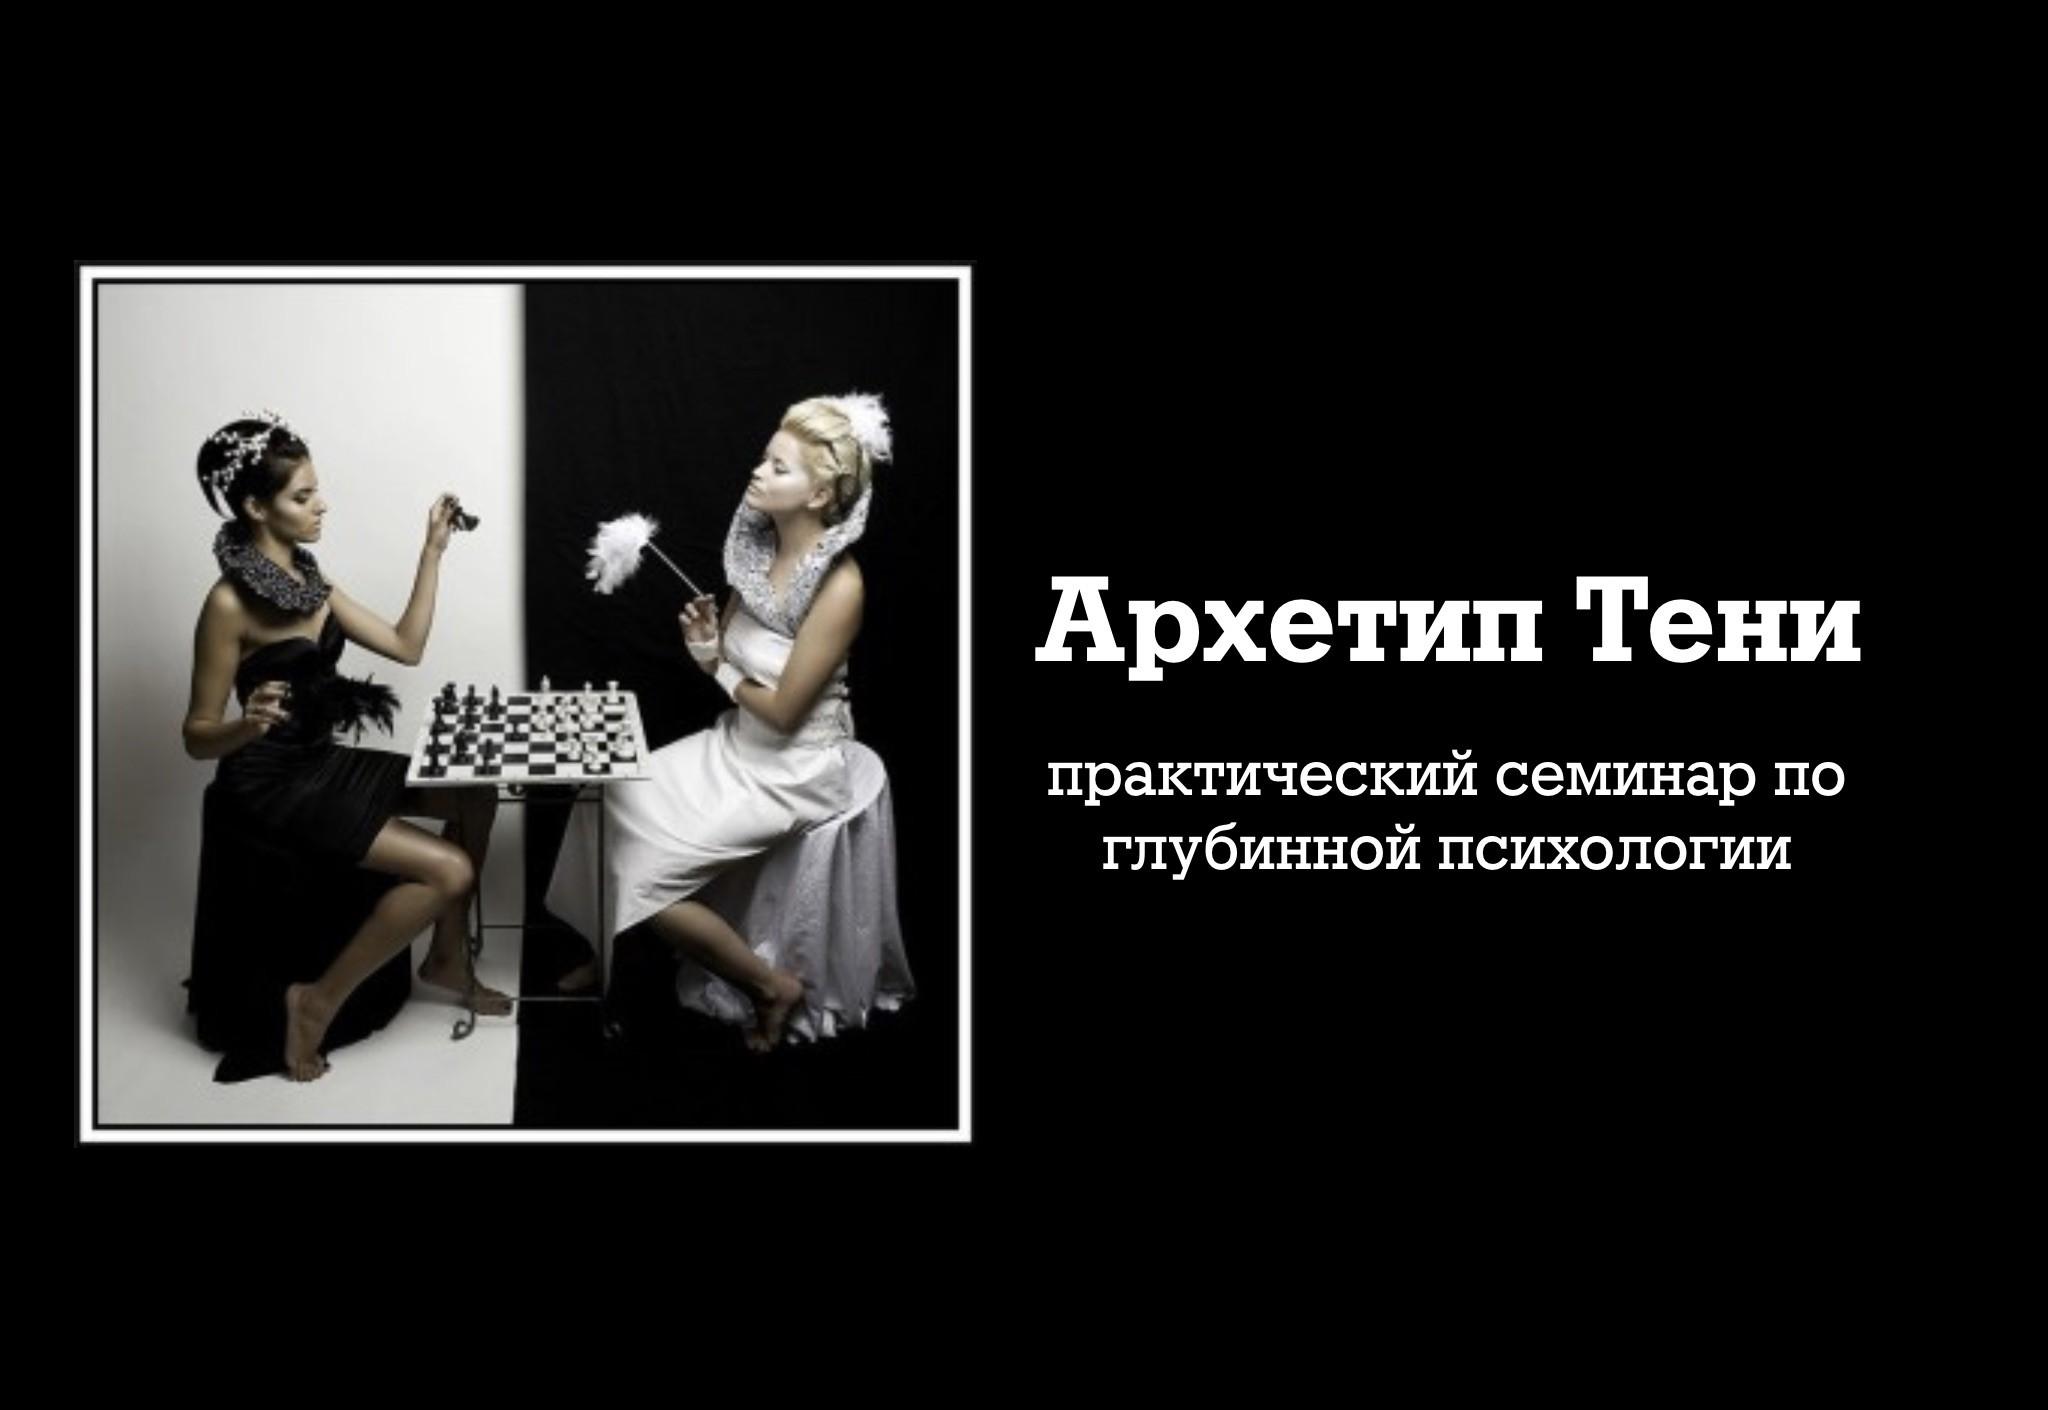 Киев. Архетип Тени. Практический семинар по глубинной психологии.